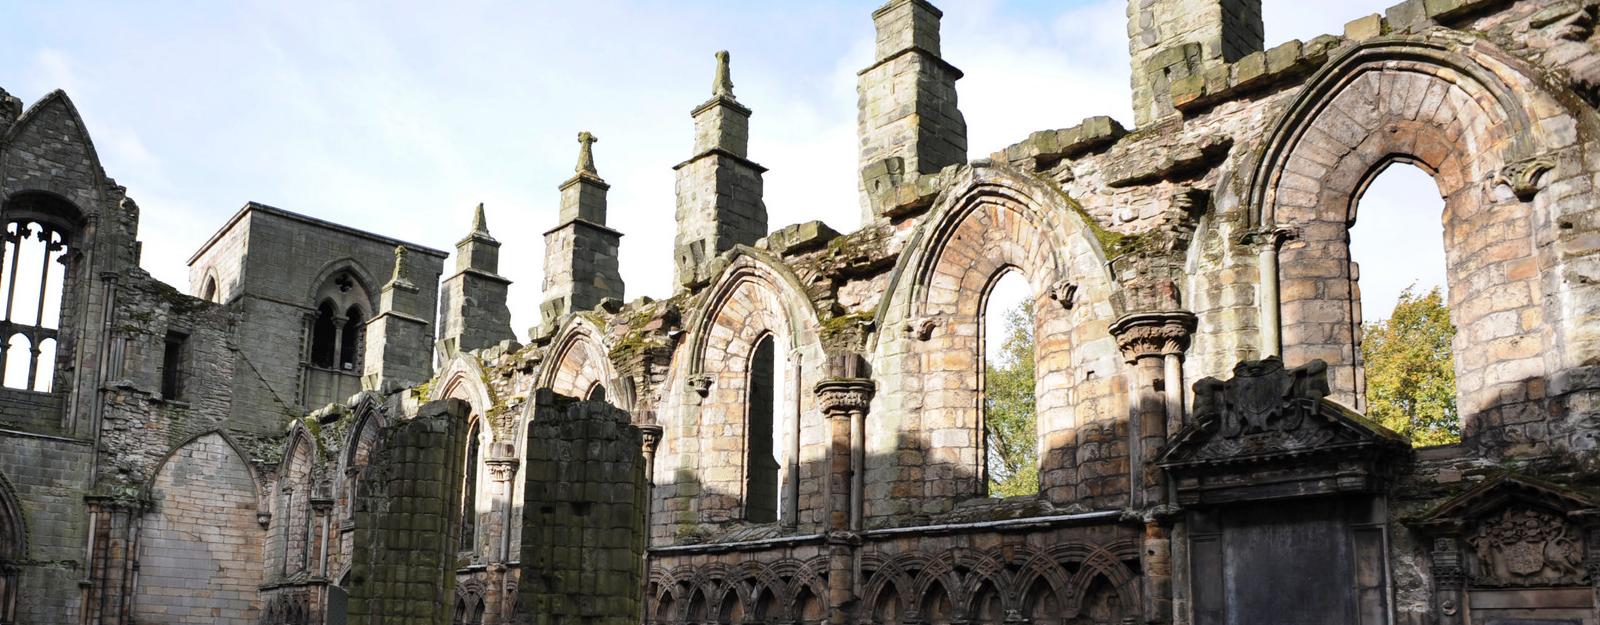 interior of Holyrood Abbey